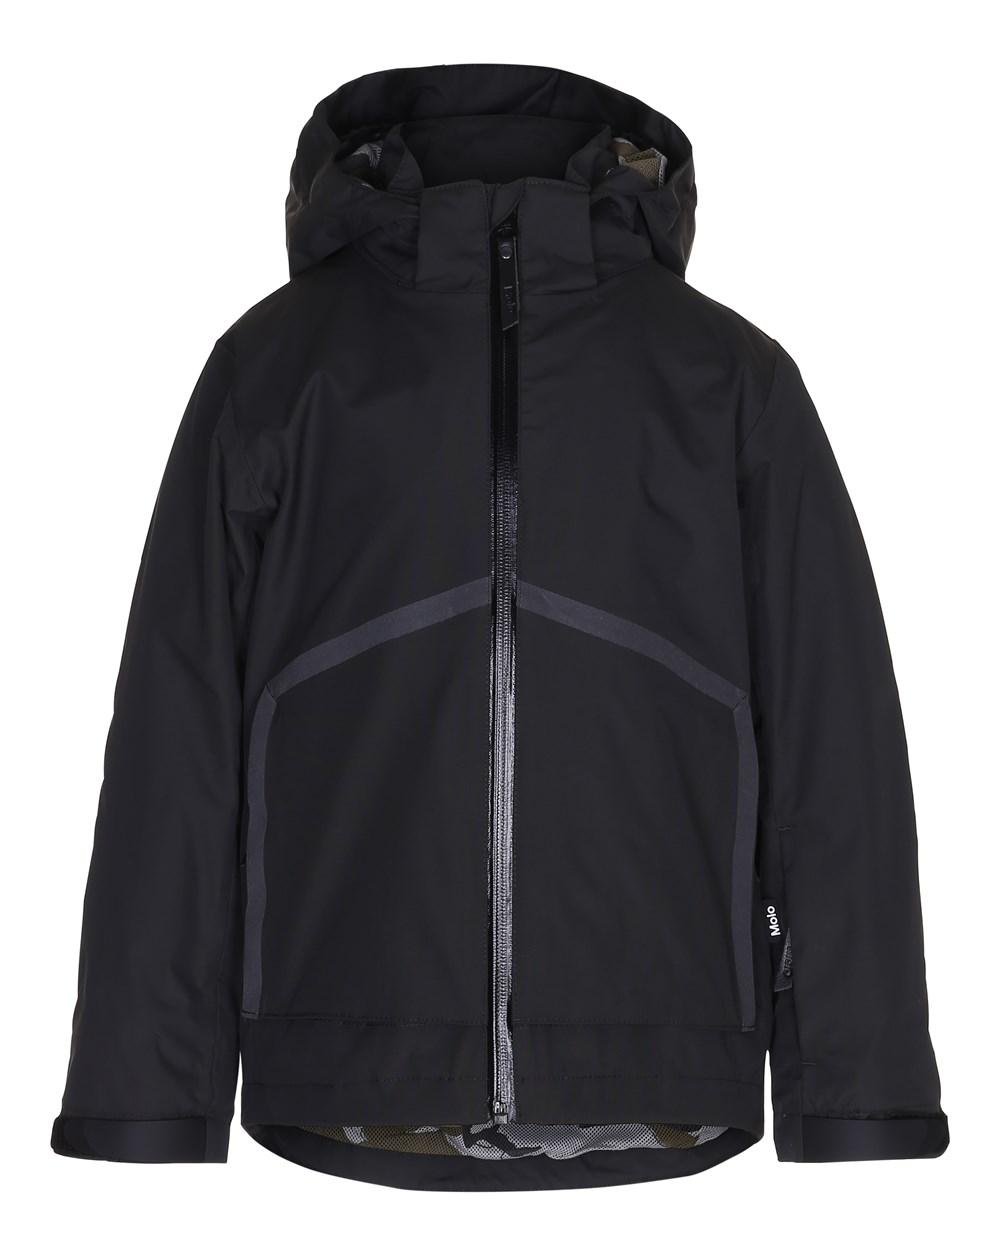 Helium - Pirate Black - Black jacket with printed lining